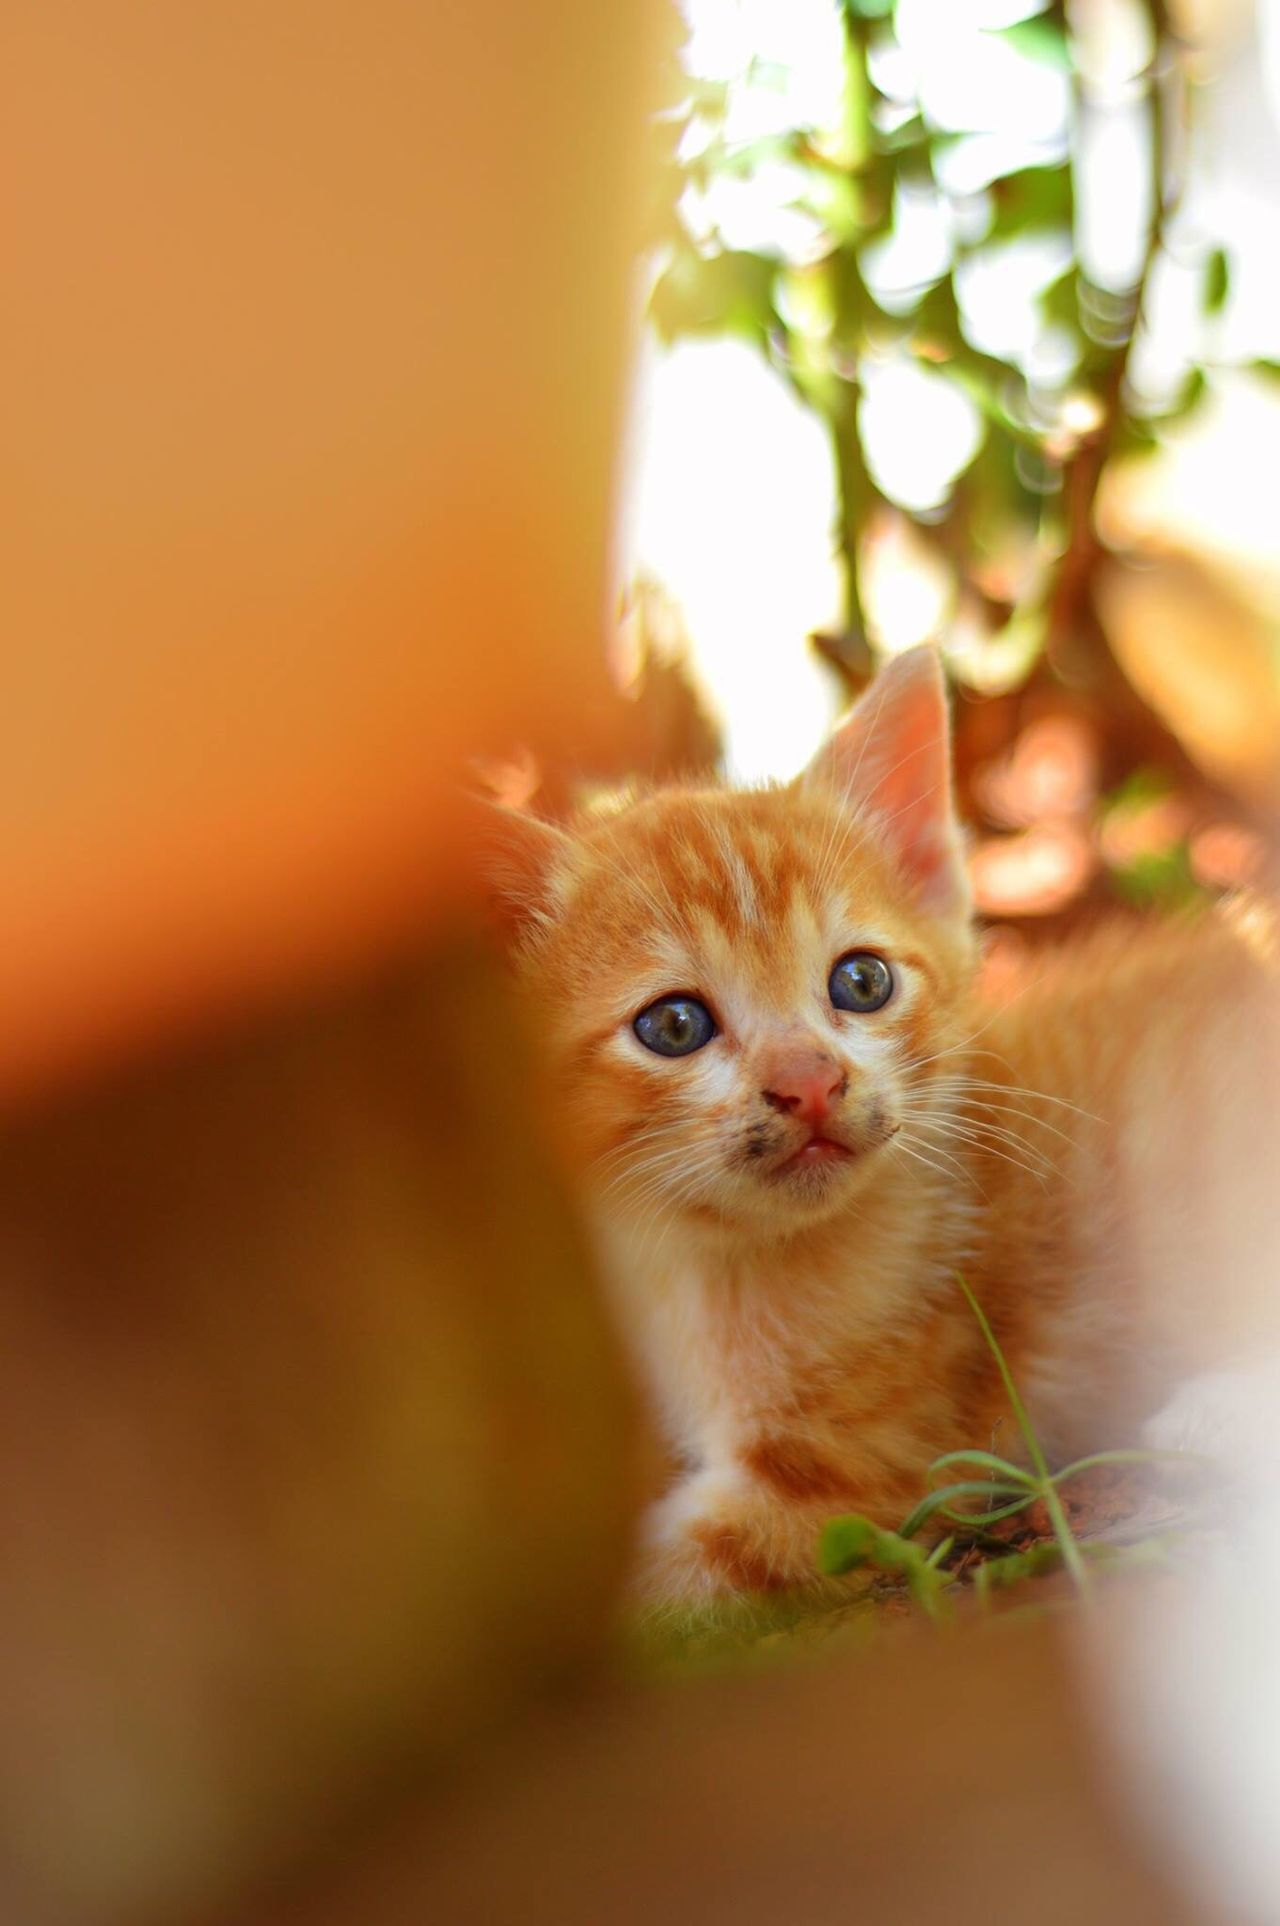 My cute baby cat 😘😍😘 Pet Animal Animal Themes Cute Babycat Kitten